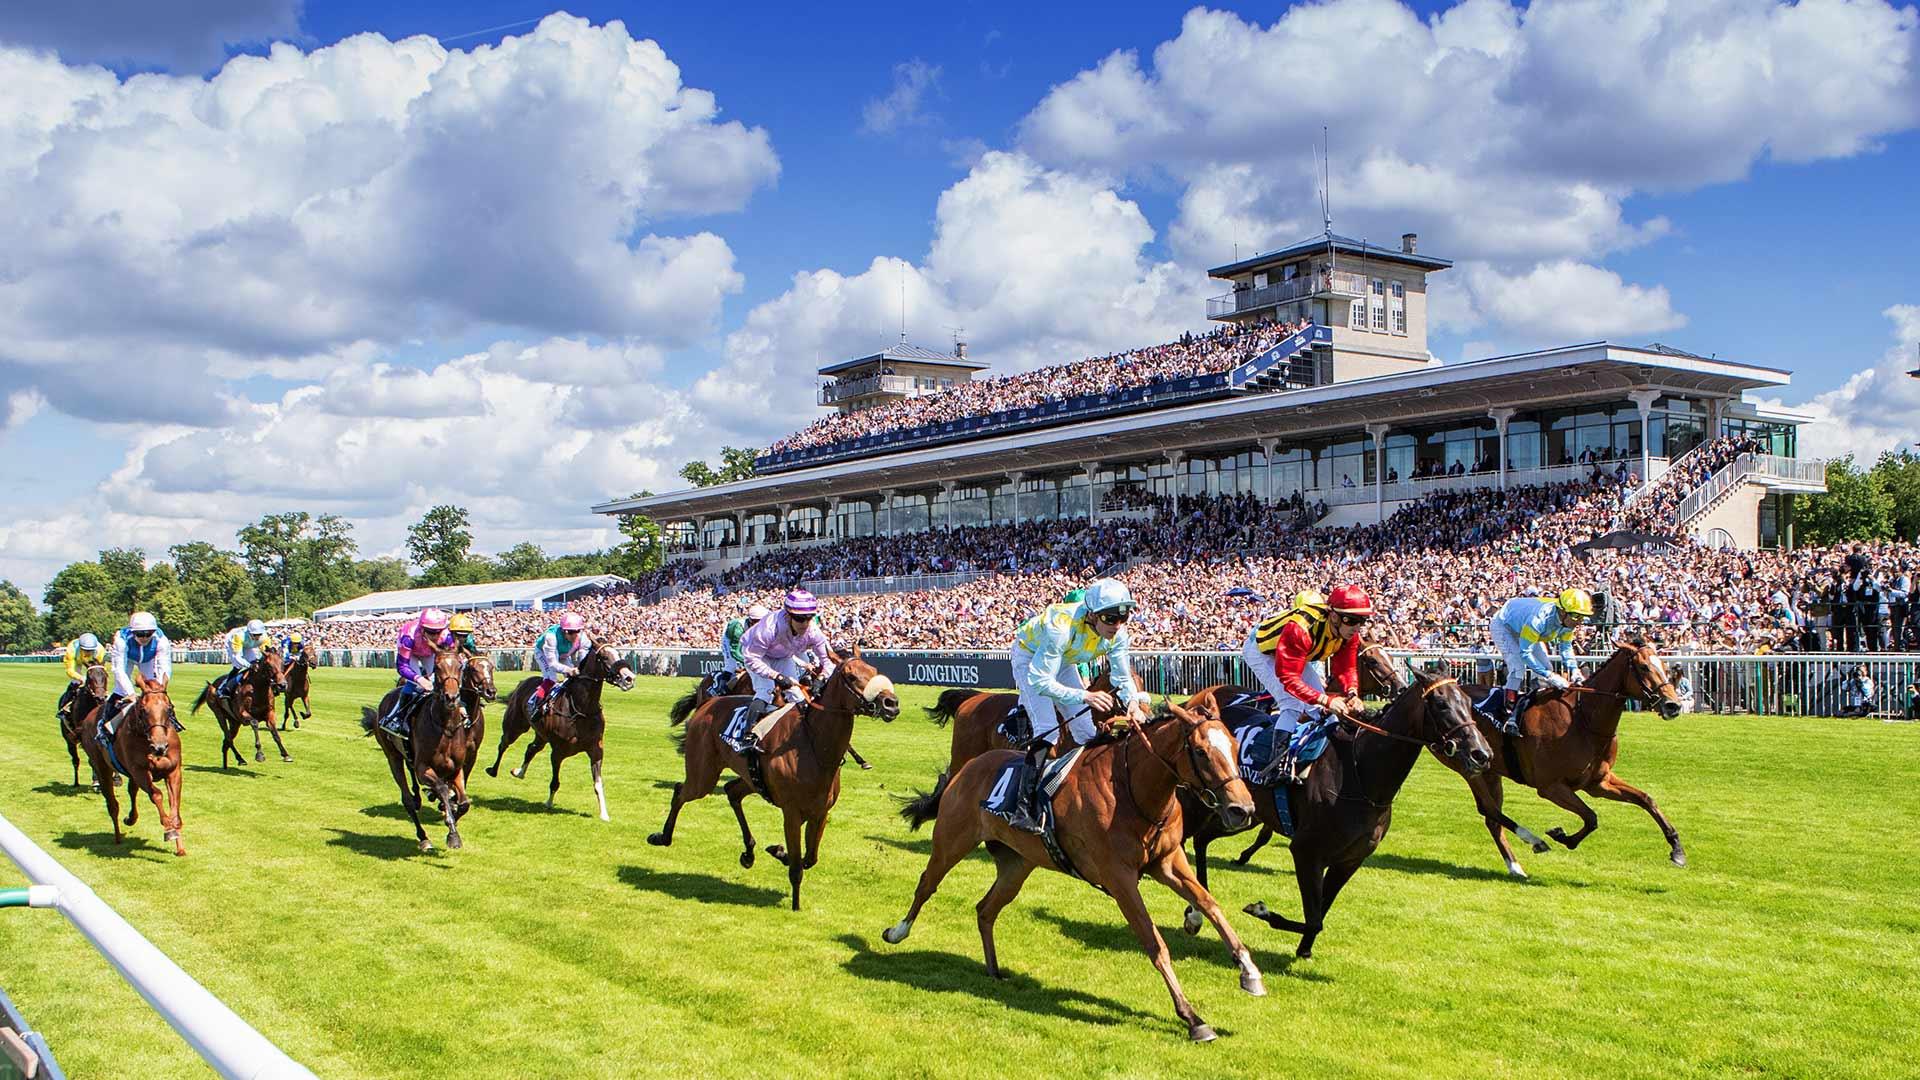 Prix du jockey club 2021 betting websites 0d 0a binary options